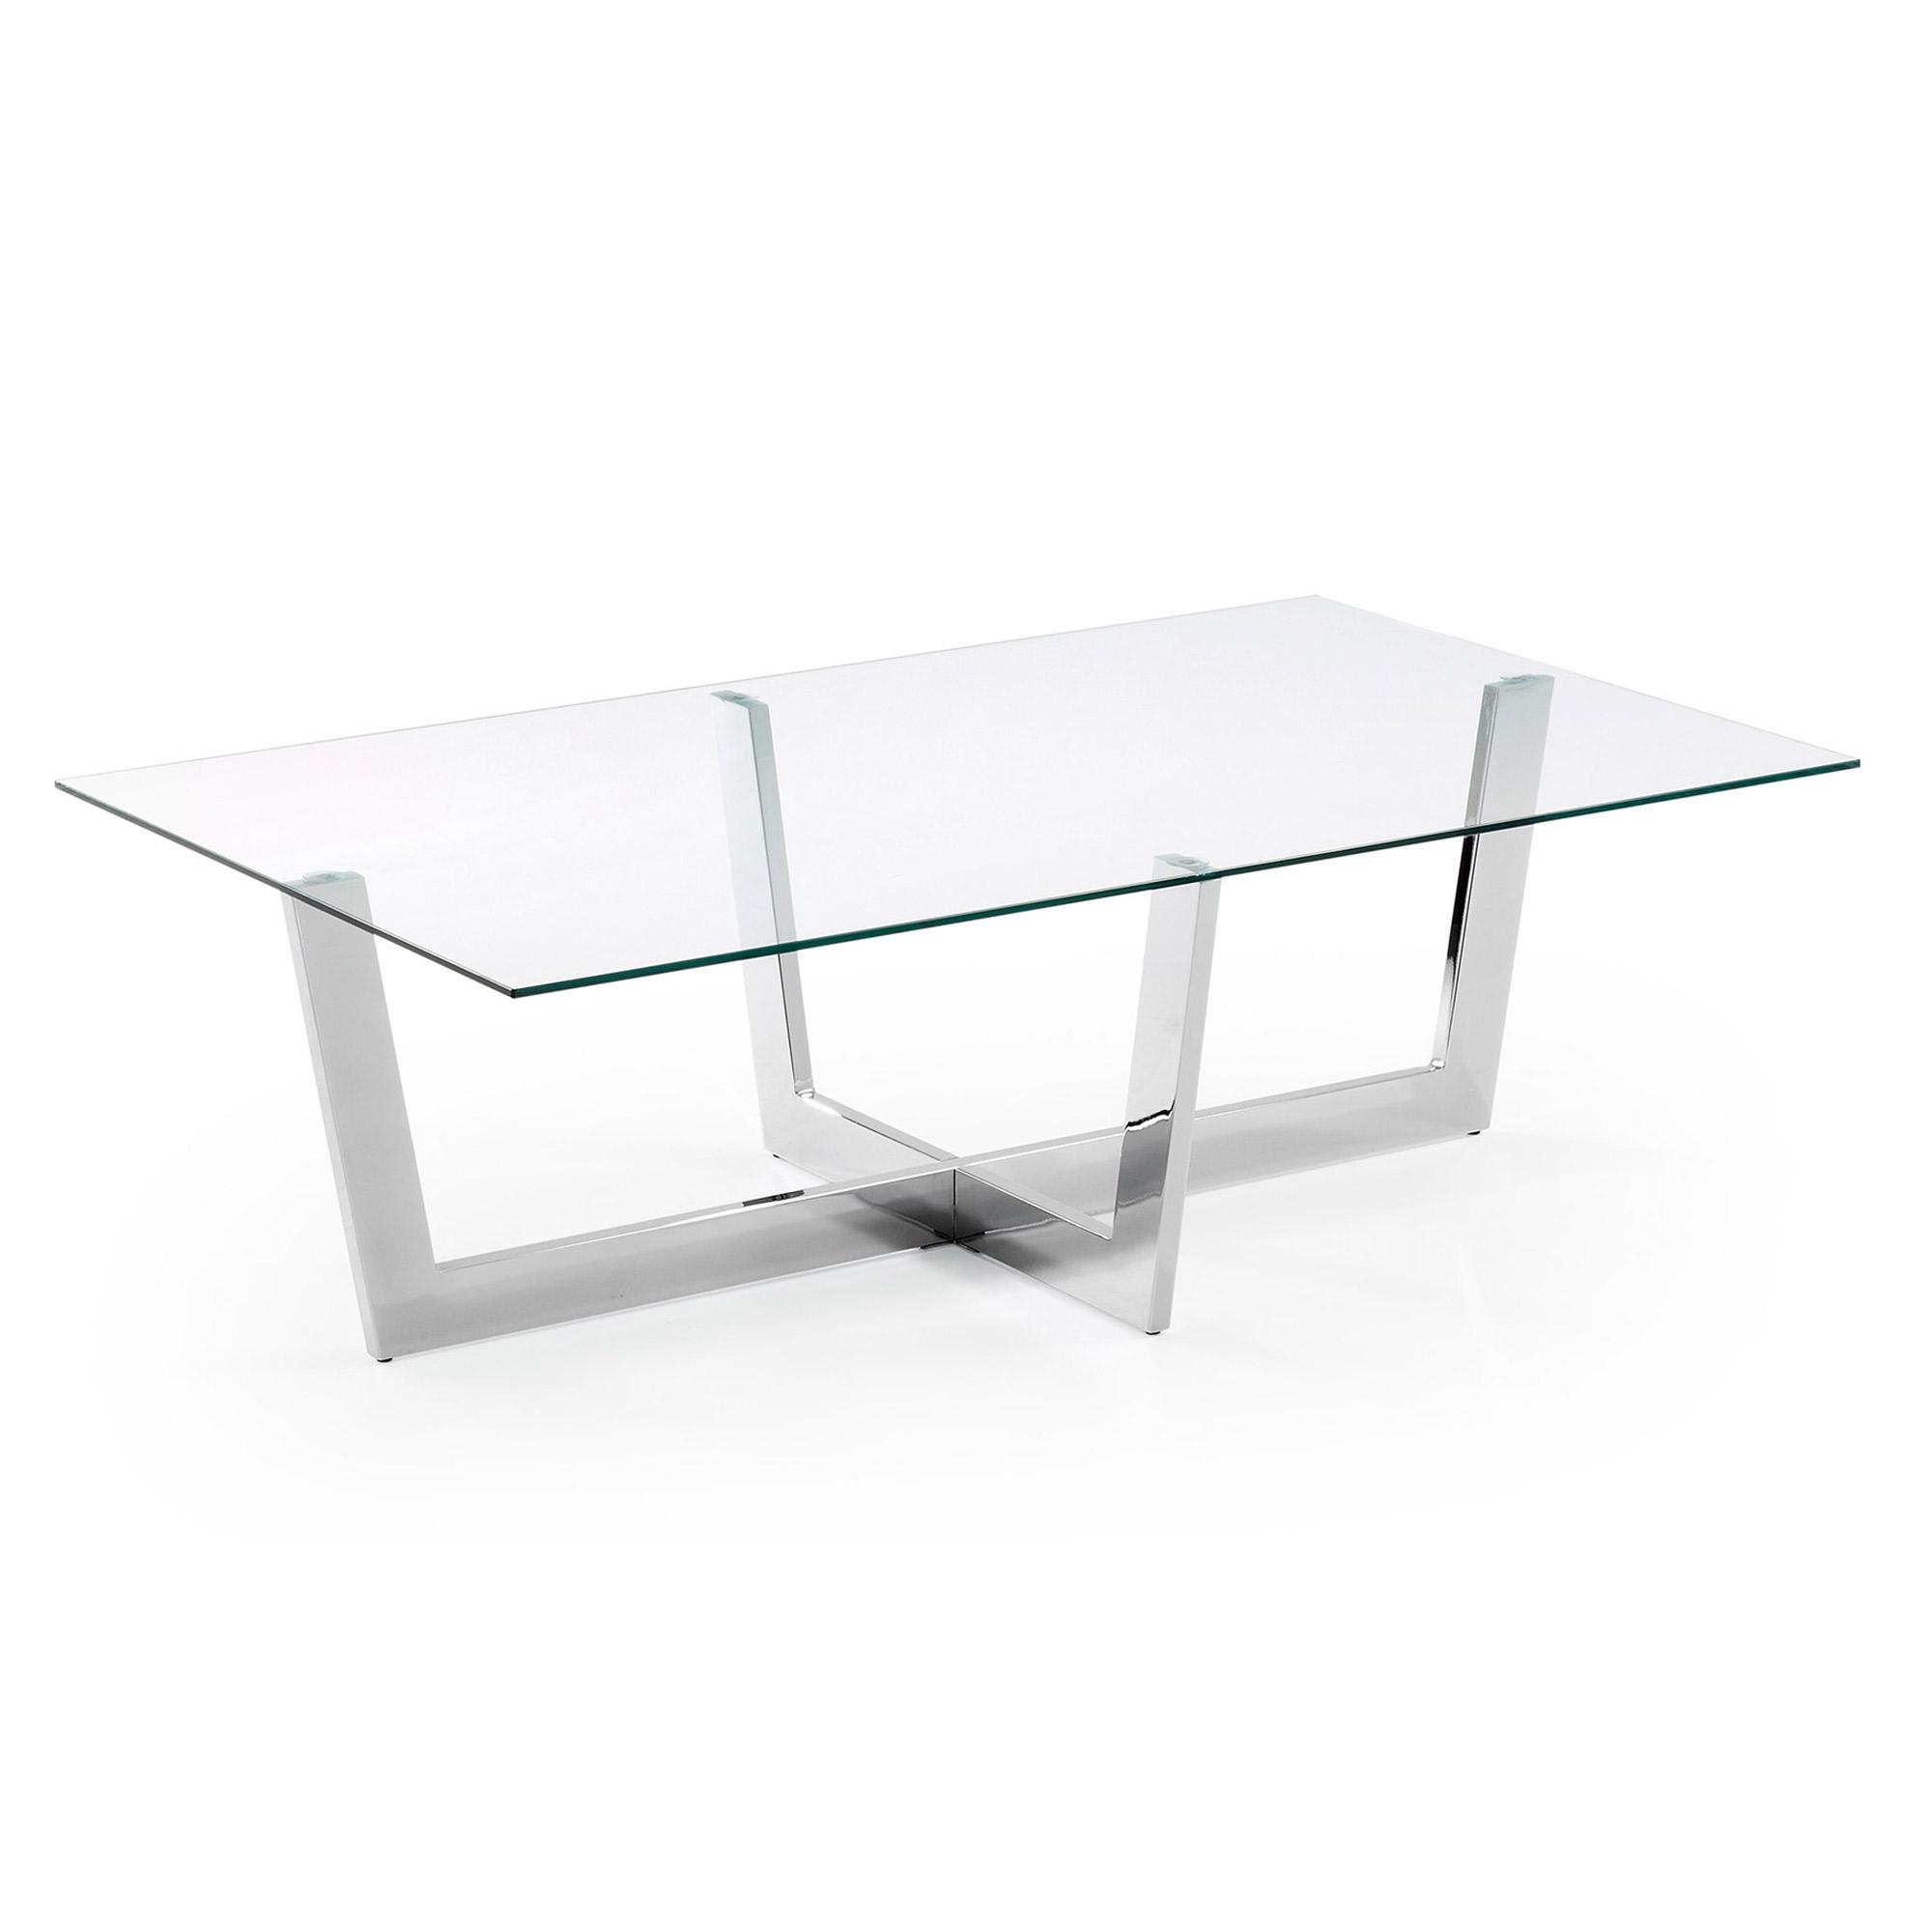 laforma Laforma plum sofabord - klar/sølv glas/stål, rektangulær (120x70) på boboonline.dk